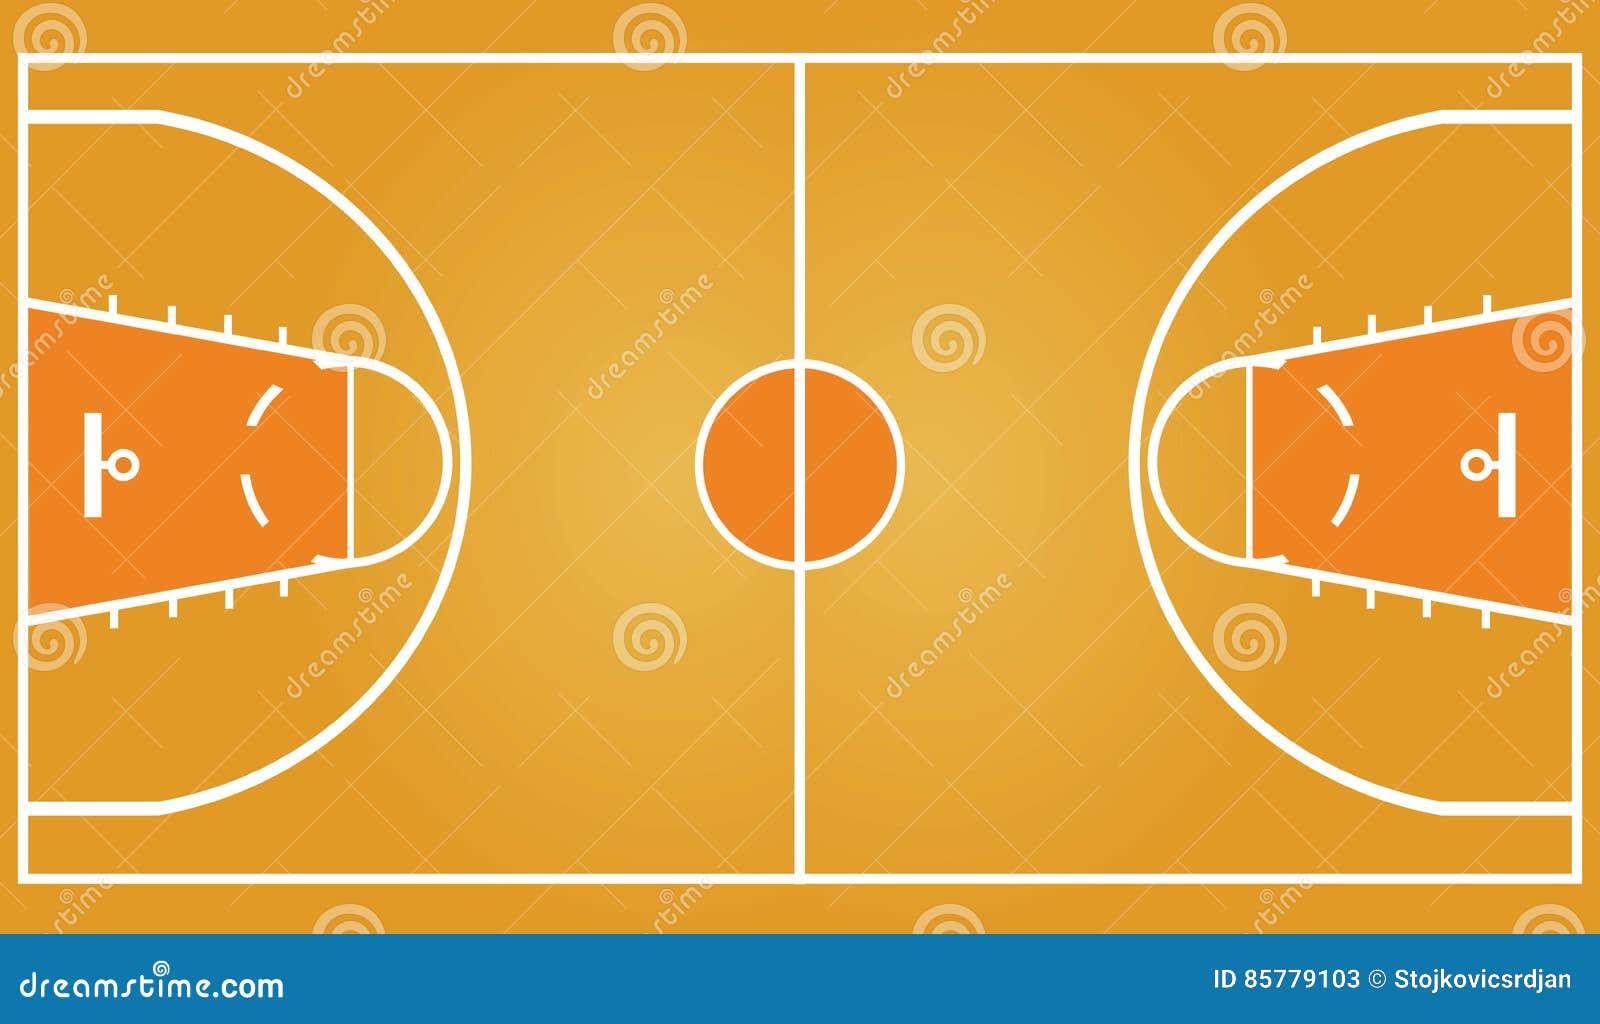 basketball court stock vector illustration of play baseline 85779103